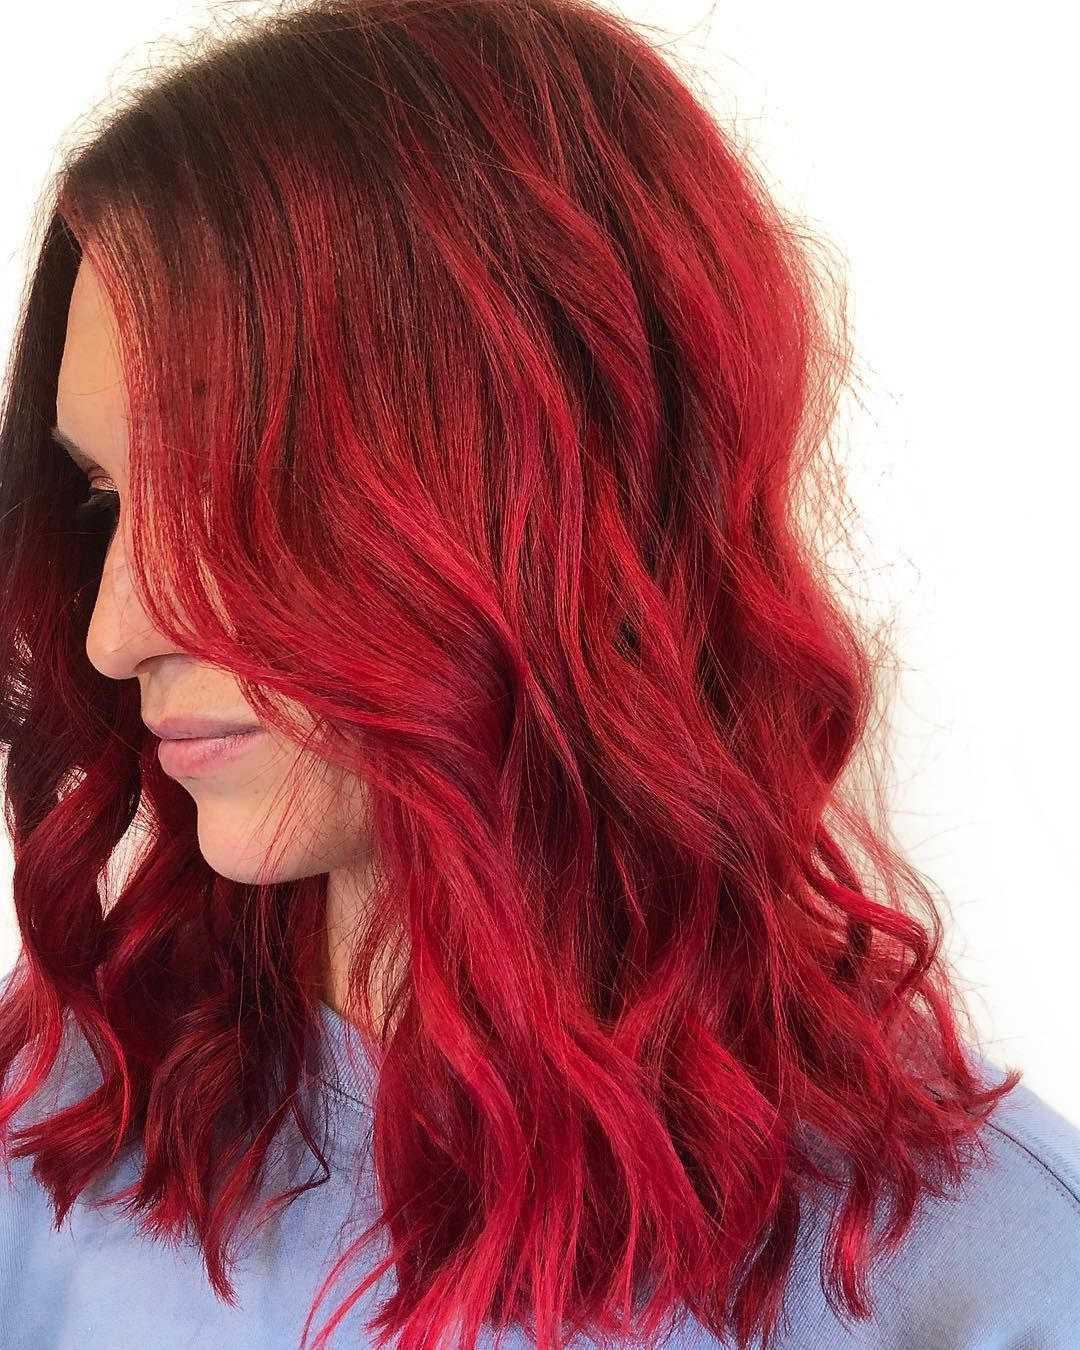 50 Best Hairstyles Red Hairstyles Hairstyles Hairstyles For Medium Length Hair Hairstyles For Short Hair Hairs Hair Styles Cool Hairstyles Short Hair Waves